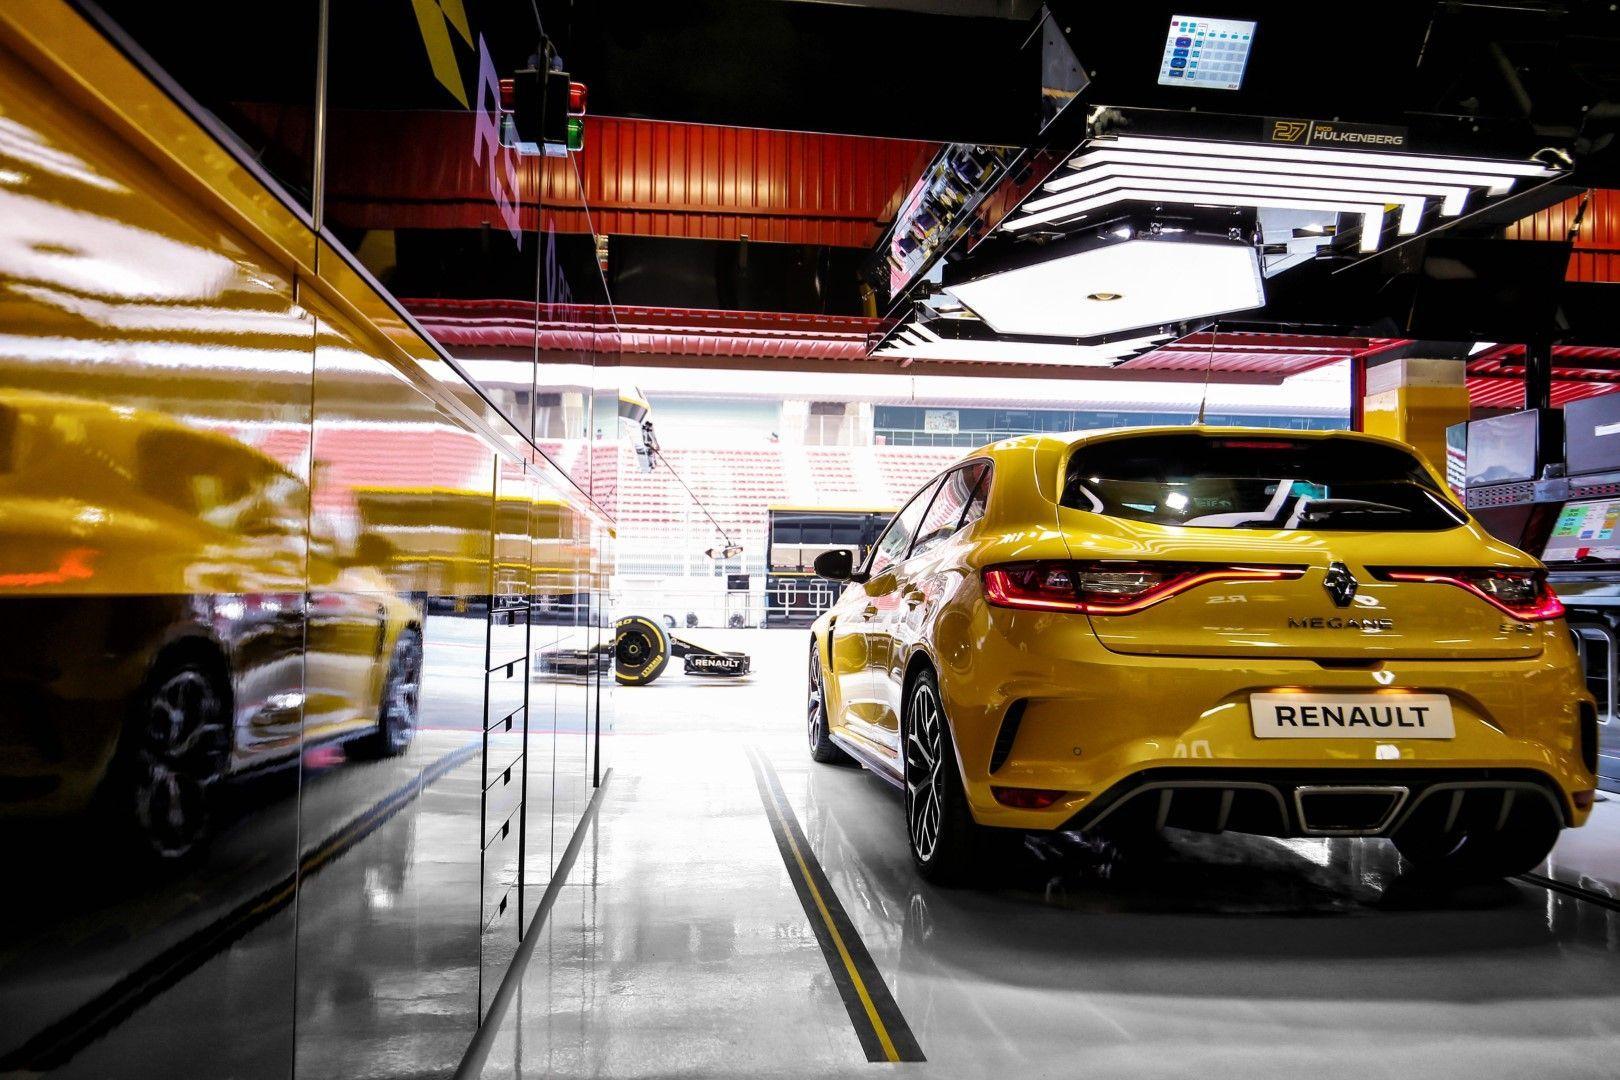 2018 Renault Megane R S Trophy Renault Megane Renault Racing Seats